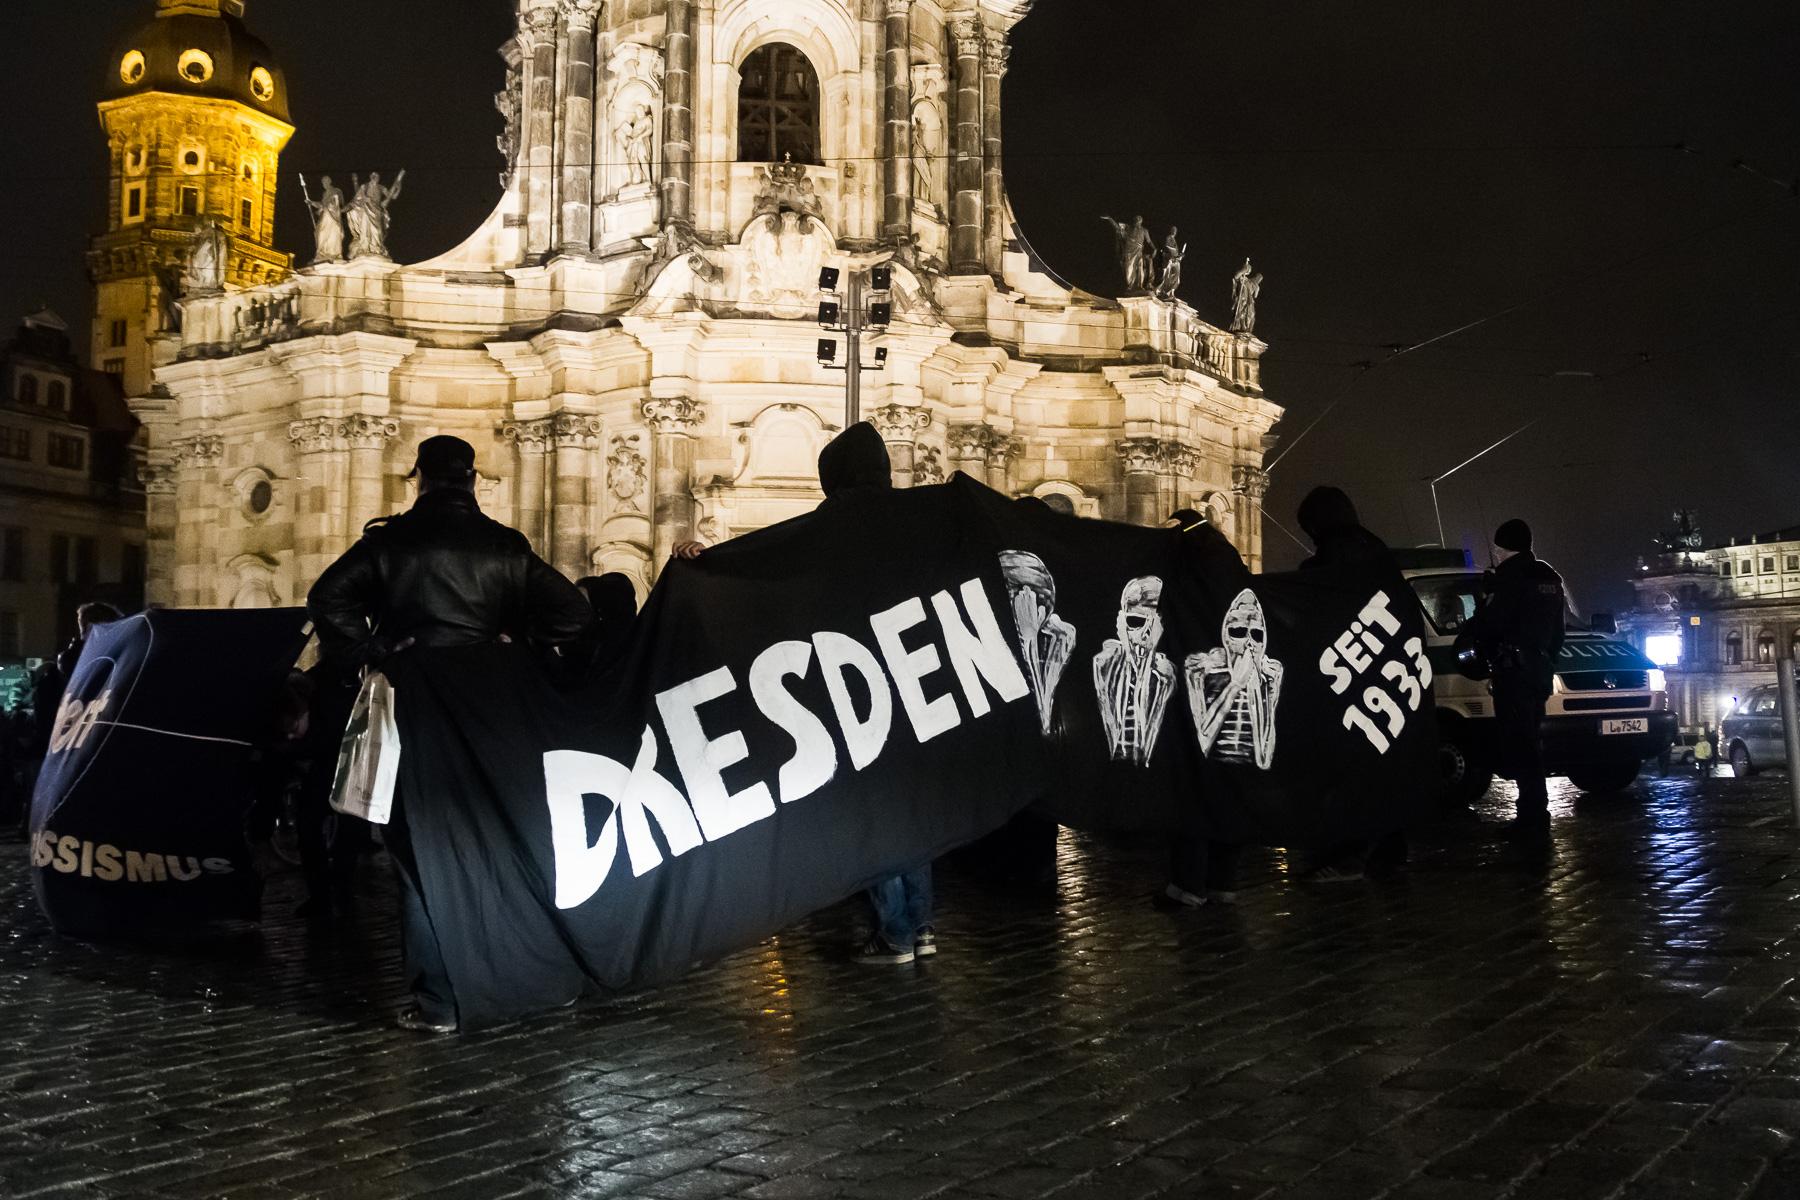 Gepida Demo vor der Hofkirche in Dresden